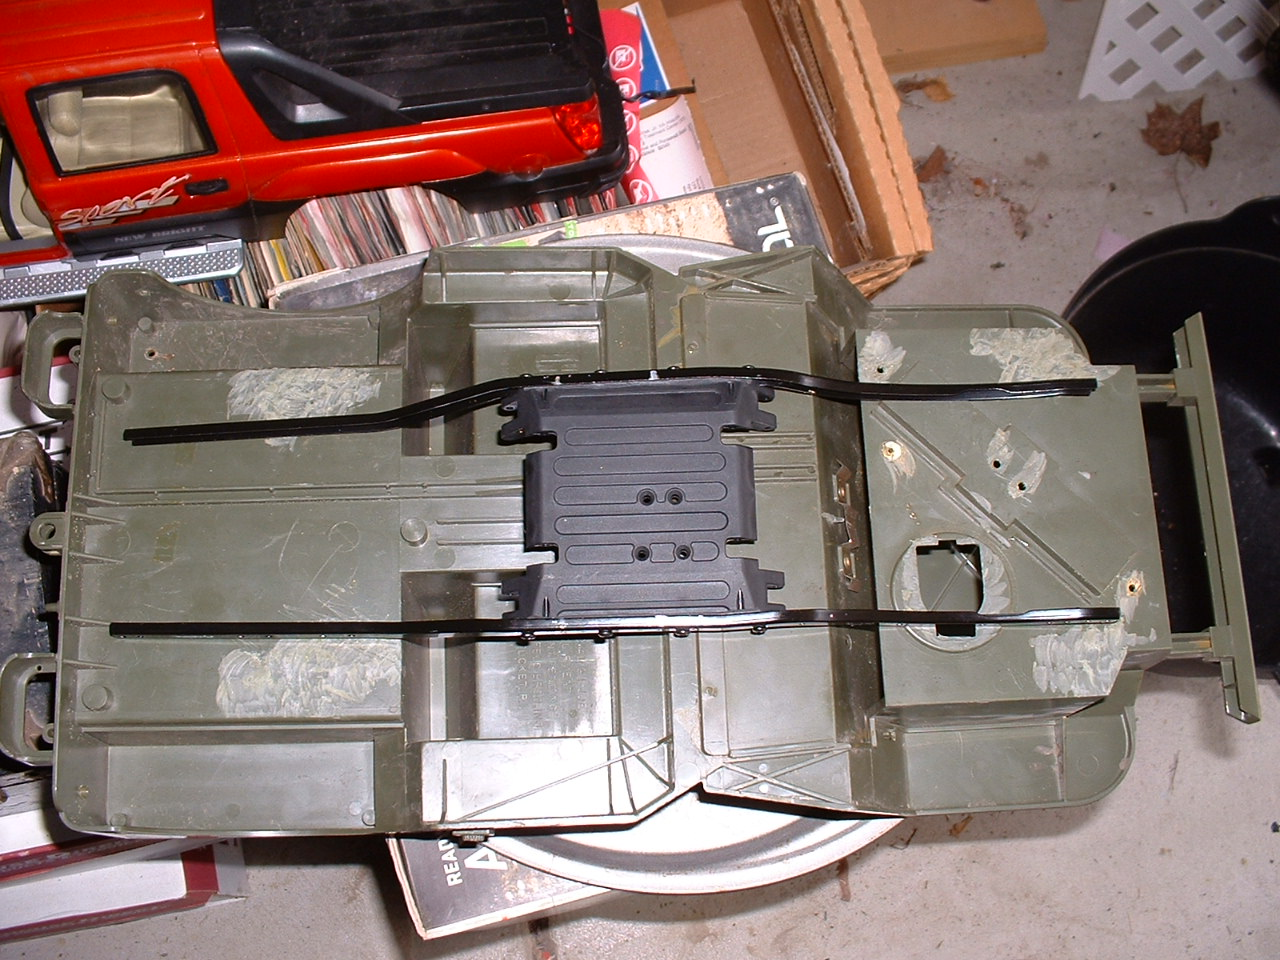 Click image for larger version  Name:G.I. Joe Jeep 004.JPG Views:2854 Size:324.4 KB ID:2037577